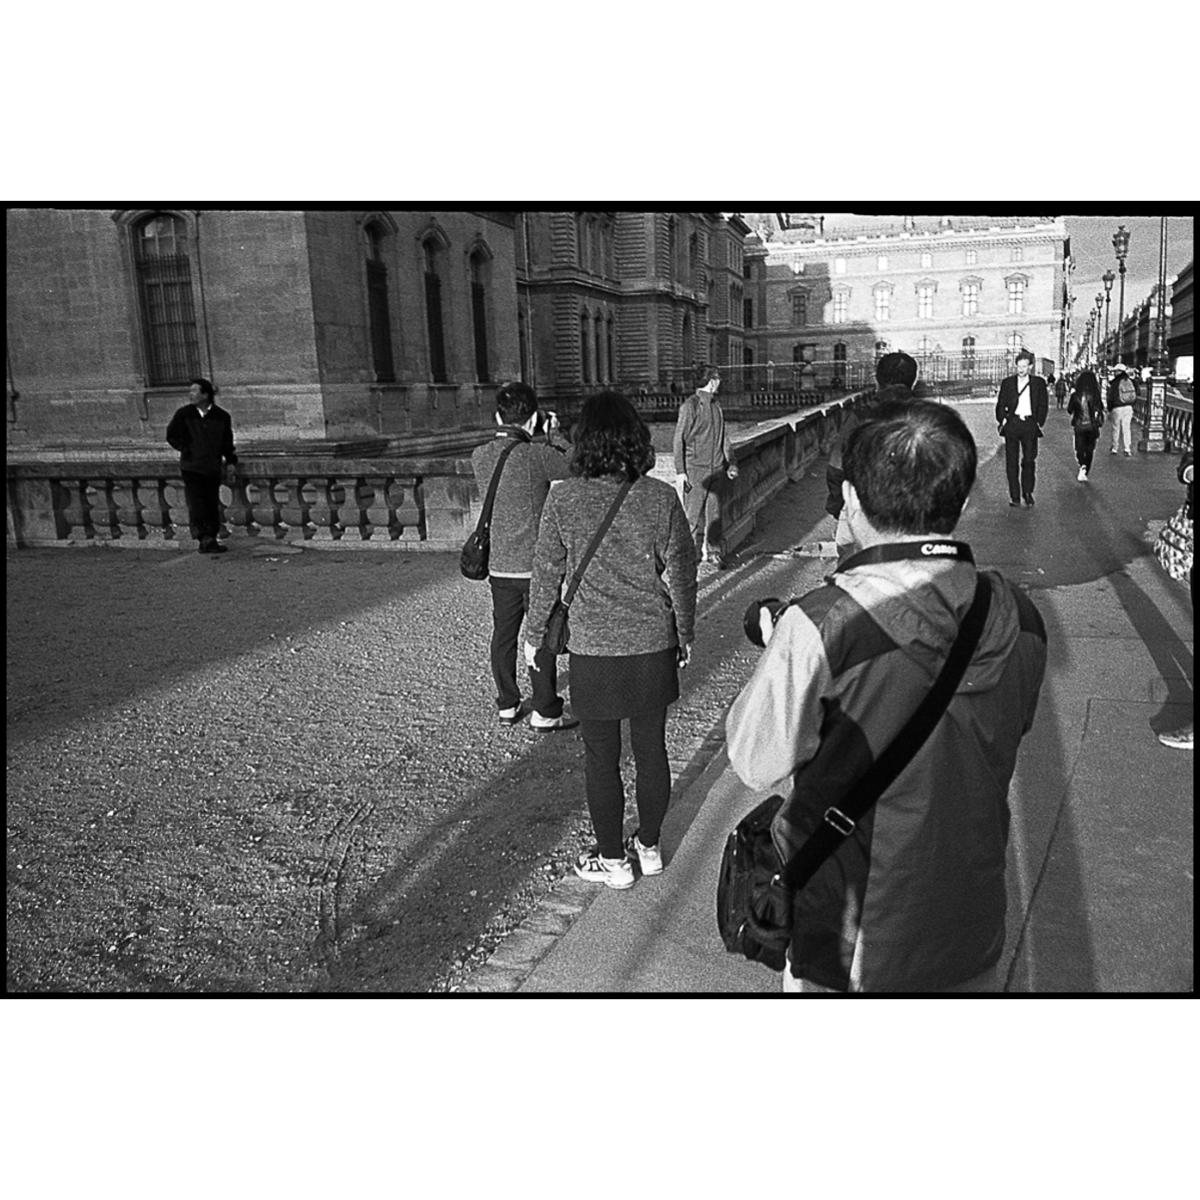 paris file-056.jpg